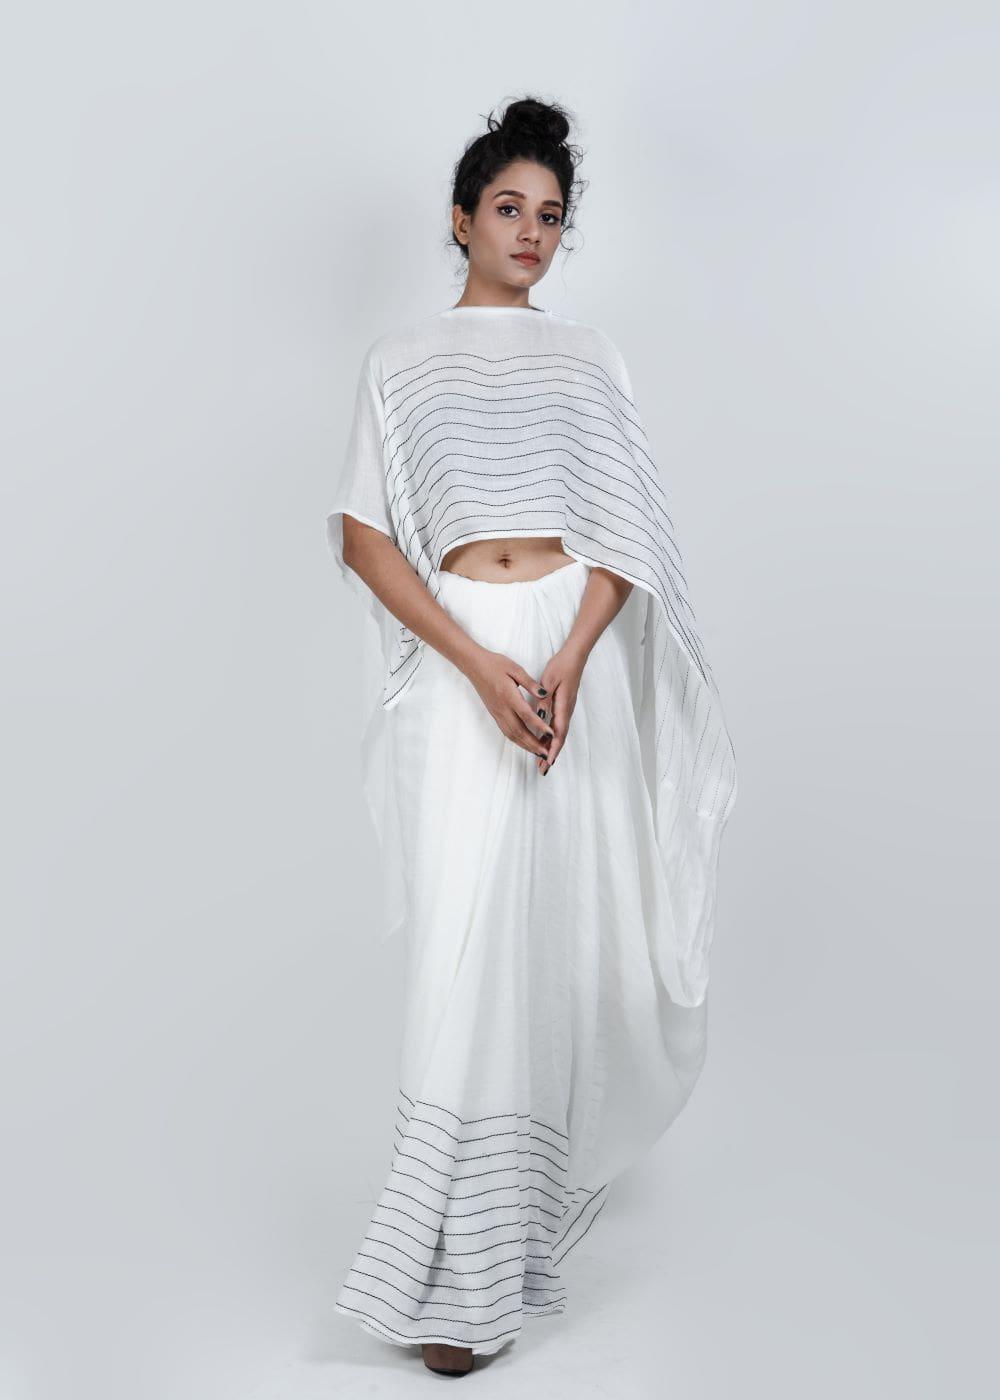 STOREAT44 | Best Black & White Clothing Brand | 6